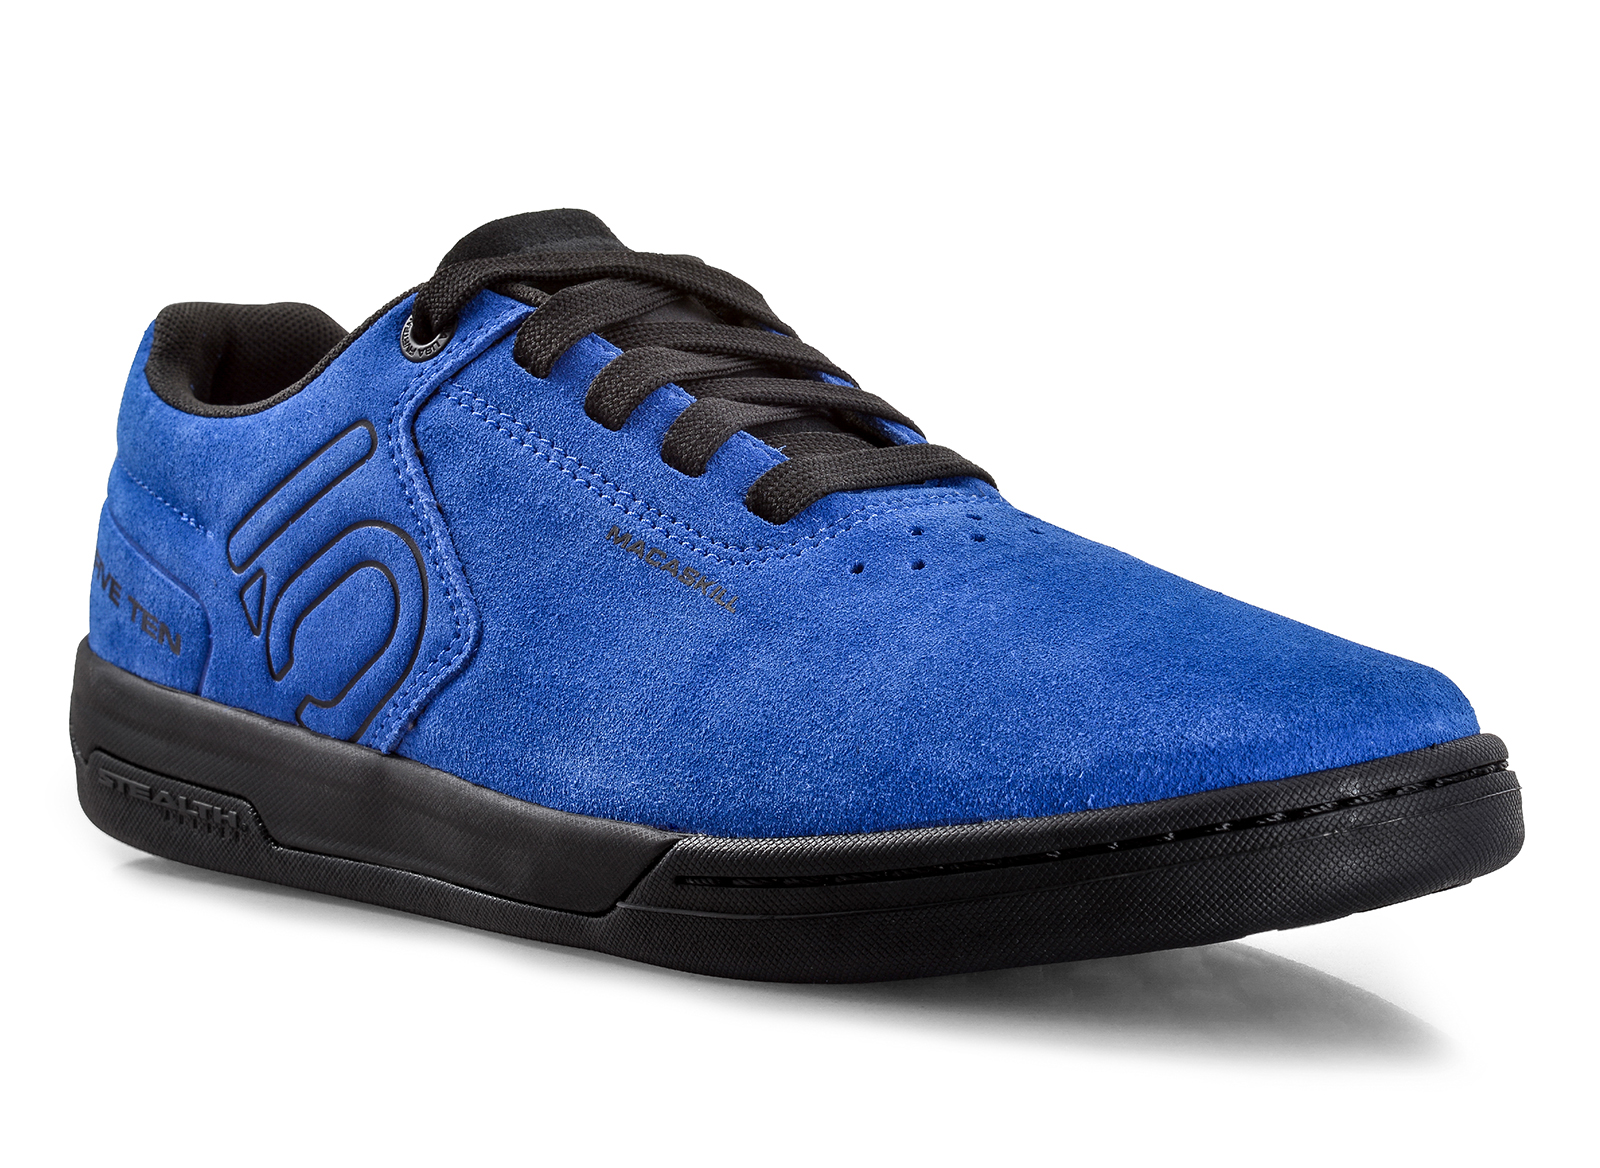 lowres_Five_Ten_Danny_MacAskill_Royal_Blue